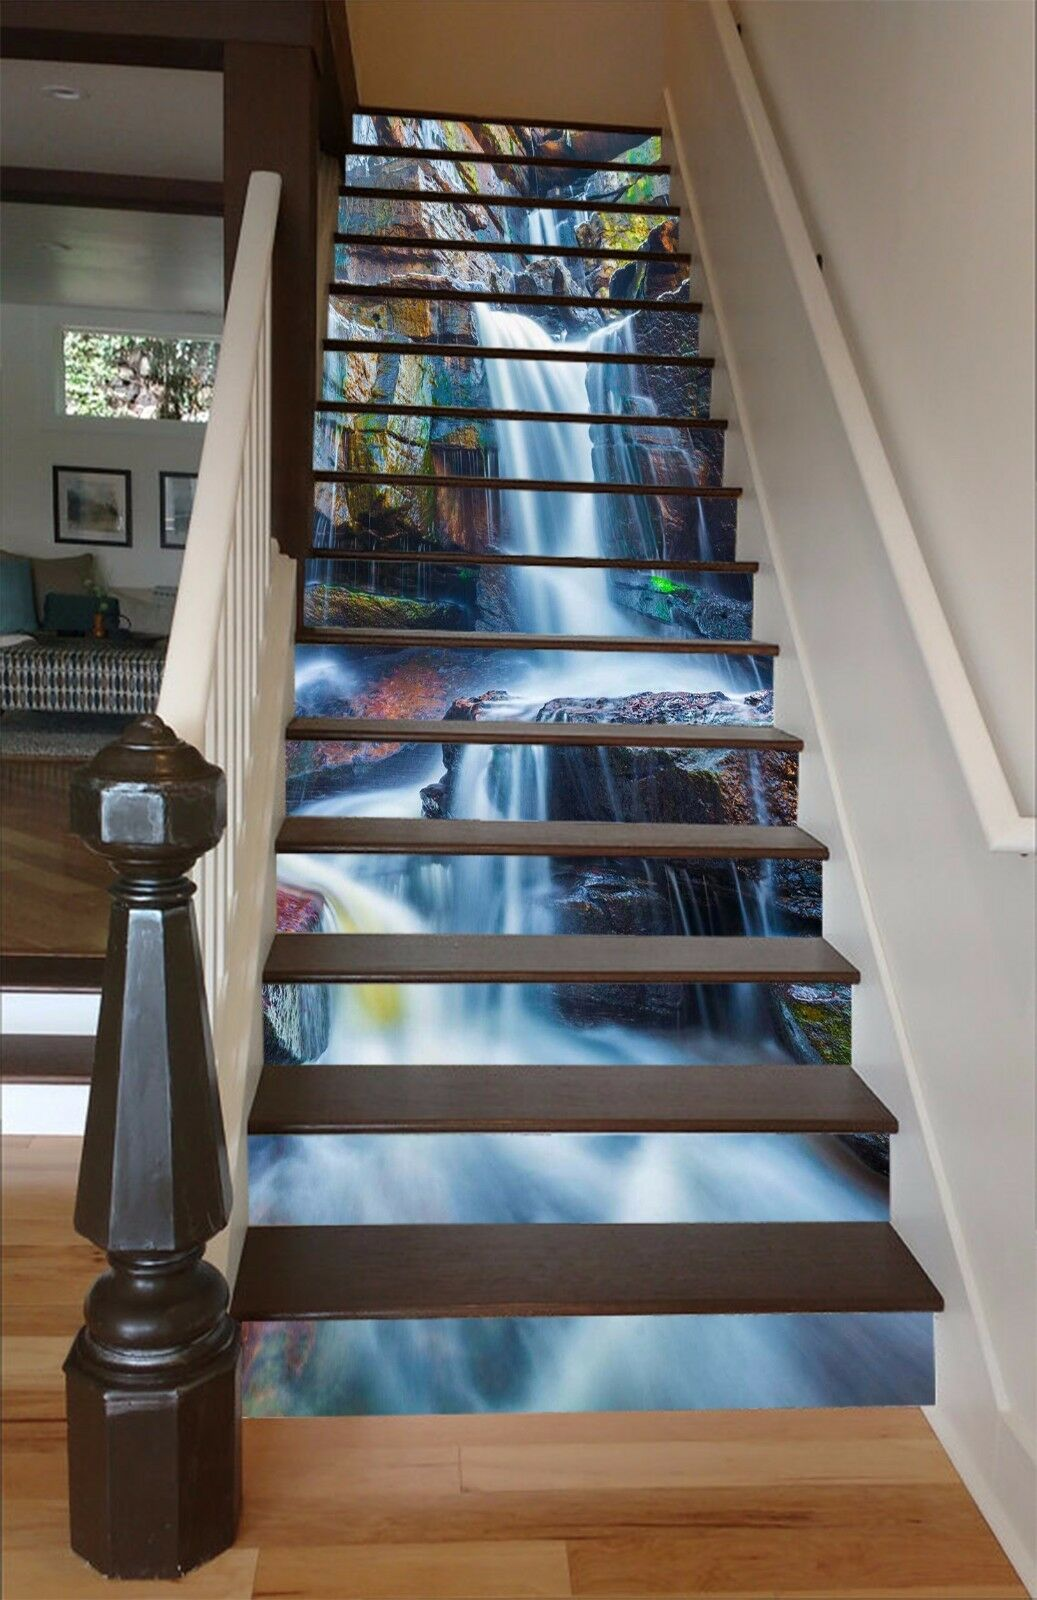 3D Waterfall stone7 Stair Risers Decoration Photo Mural Vinyl Decal WandPapier UK